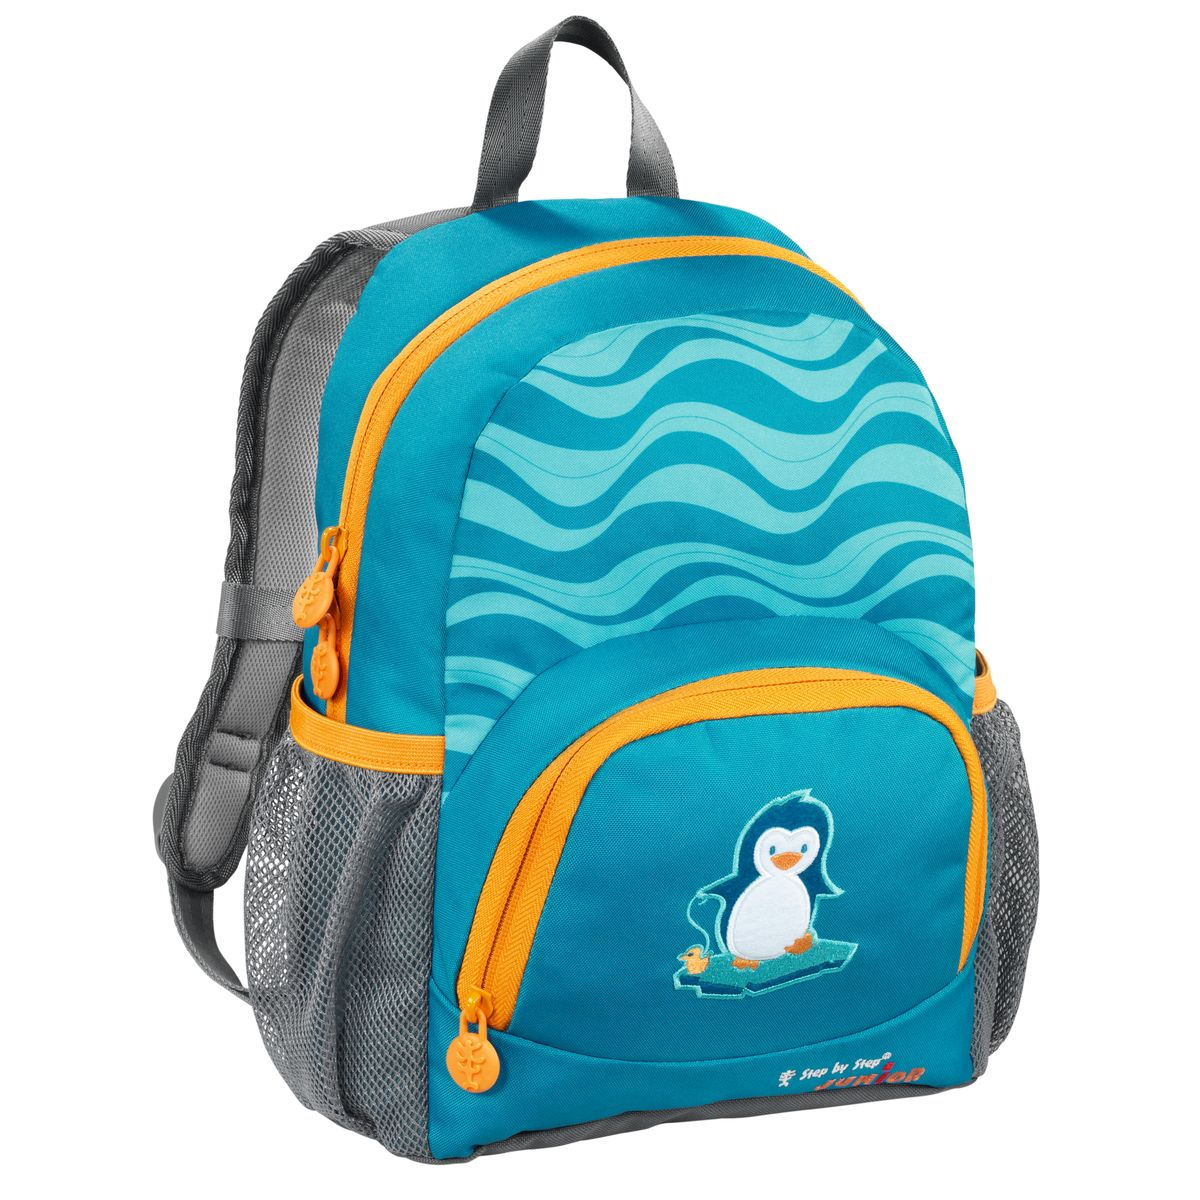 Hama Рюкзак детский Step By Step Junior Dressy Little Penguin730396Рюкзак детский Step By Step Junior Dressy little penguin голубой/серый